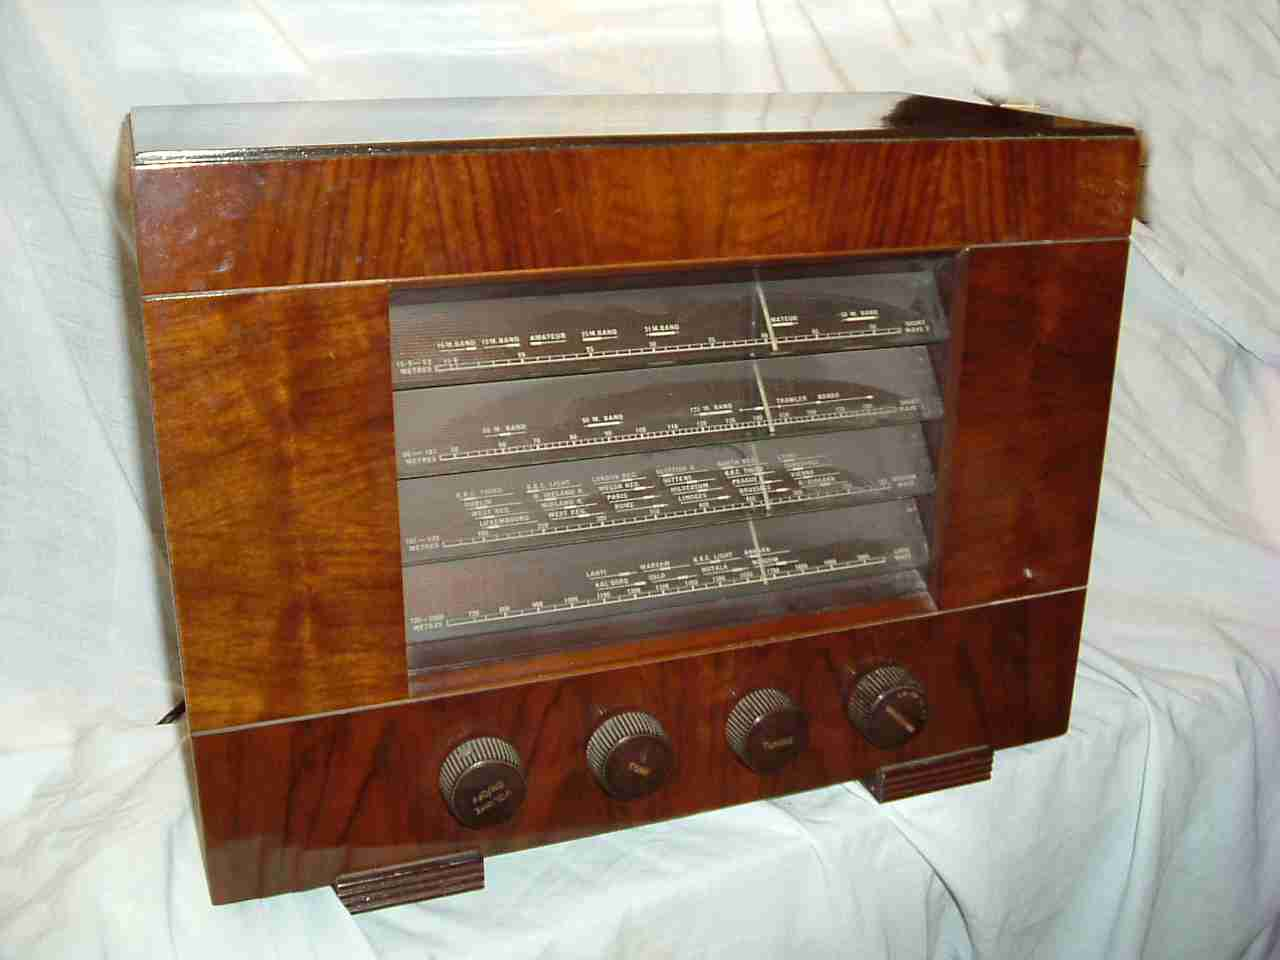 Hmv Radiogram